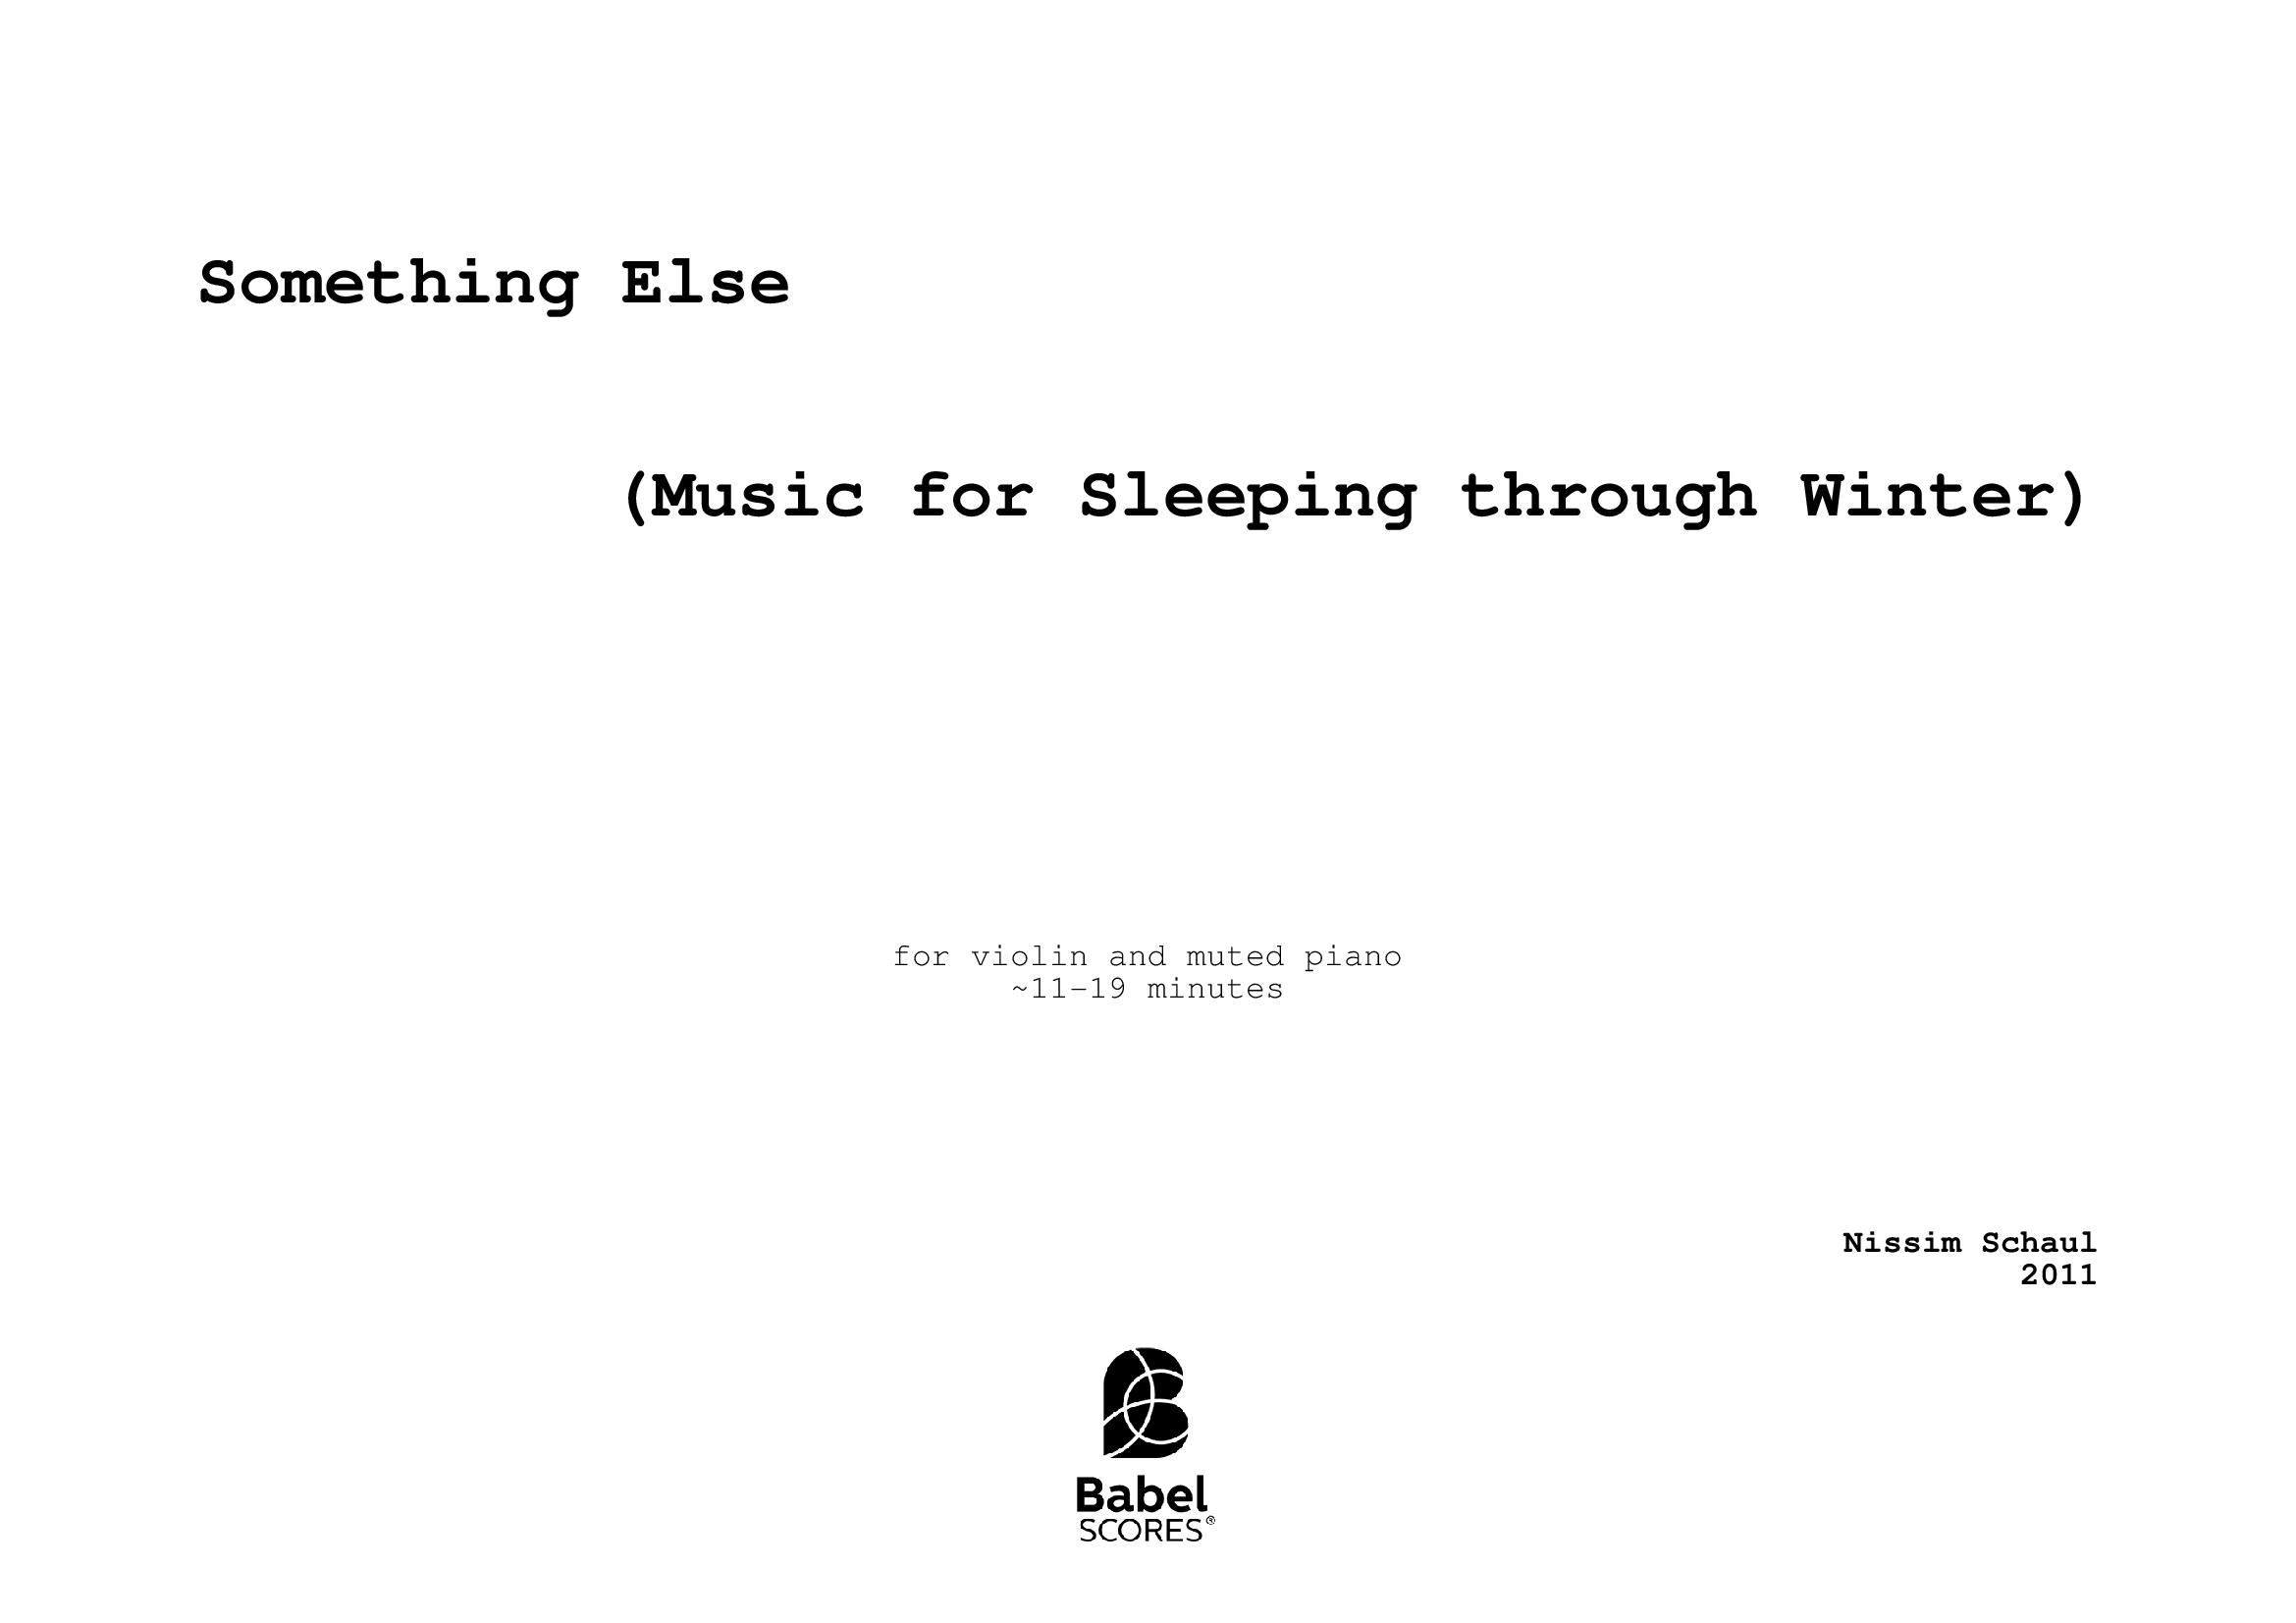 Something Else (Music for Sleeping through Winter)